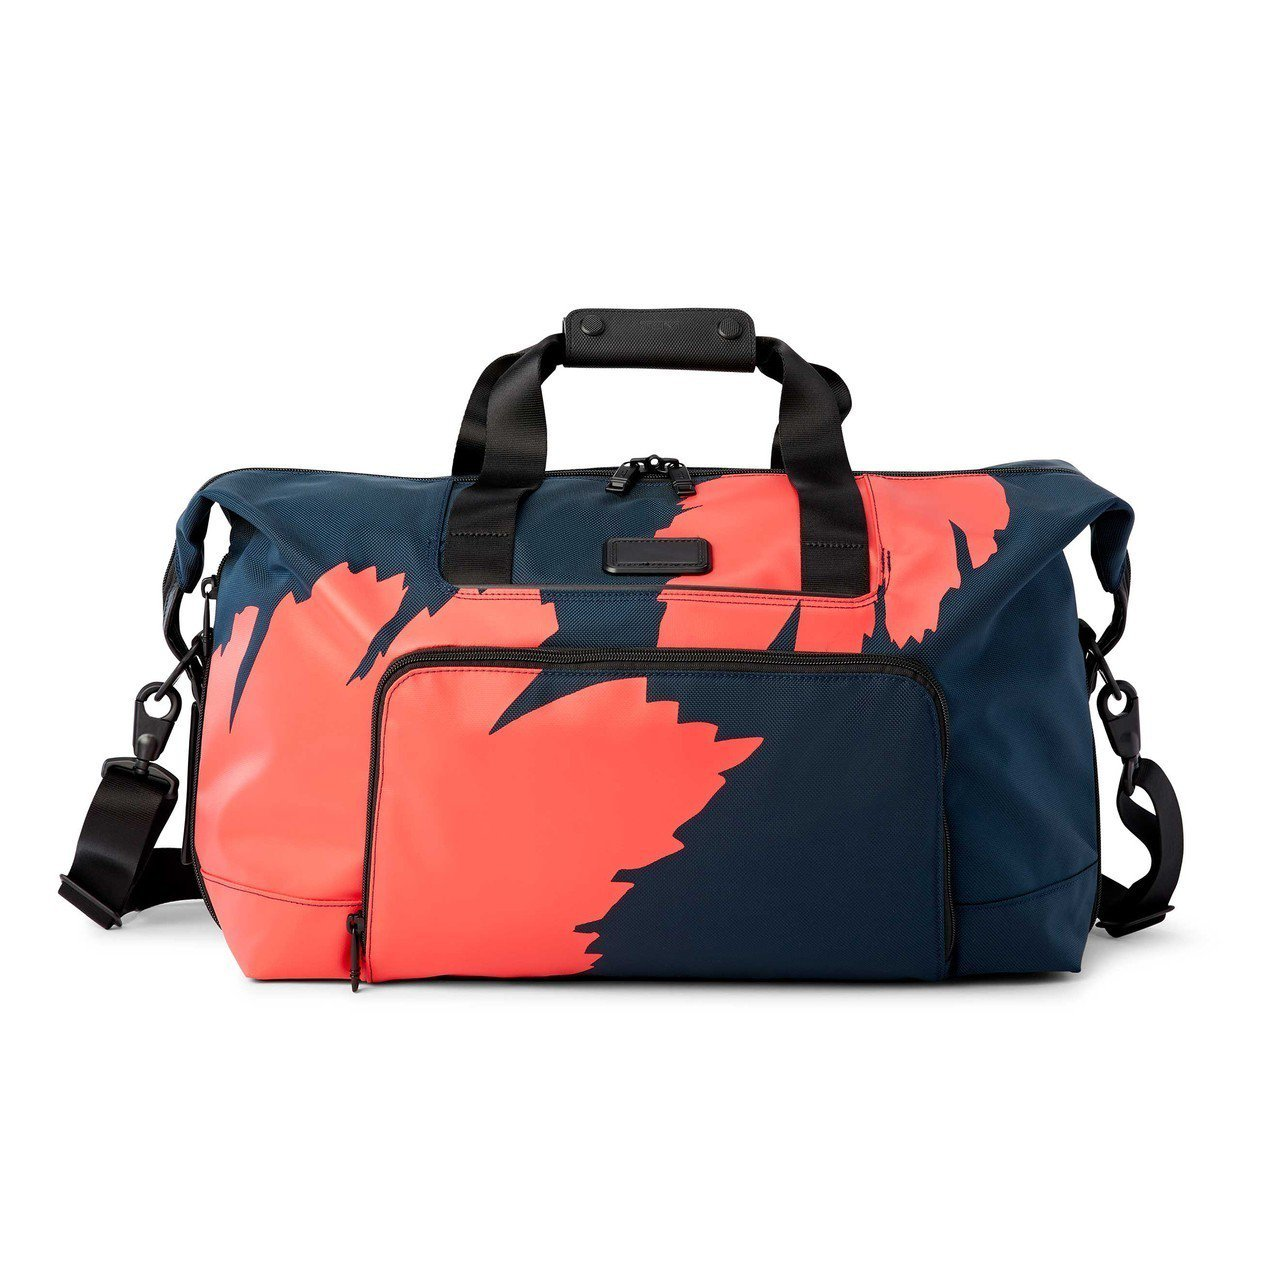 TUMI Alpha 3系列剛果印花旅行袋18,800元。圖/TUMI提供